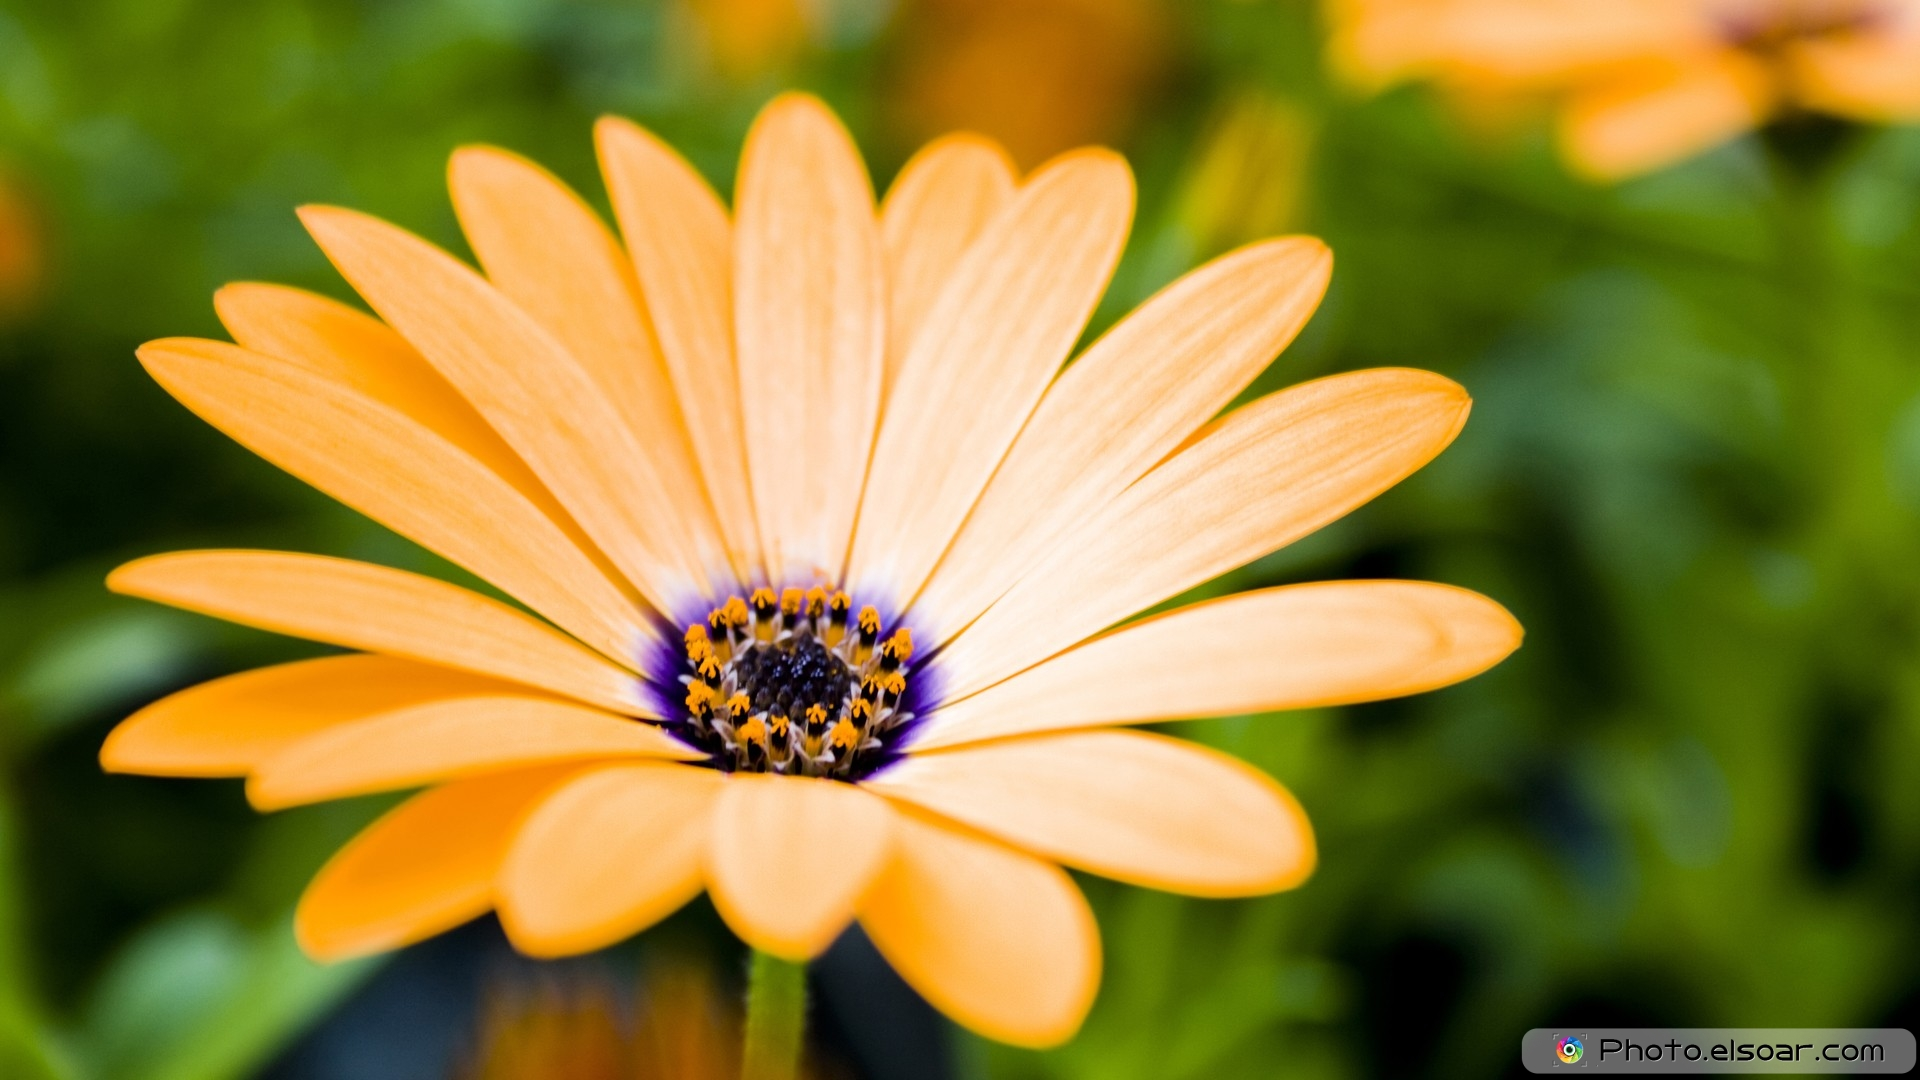 Hd wallpaper yellow rose - Beautiful Yellow Rose Amid Grass Wallpaper Hd